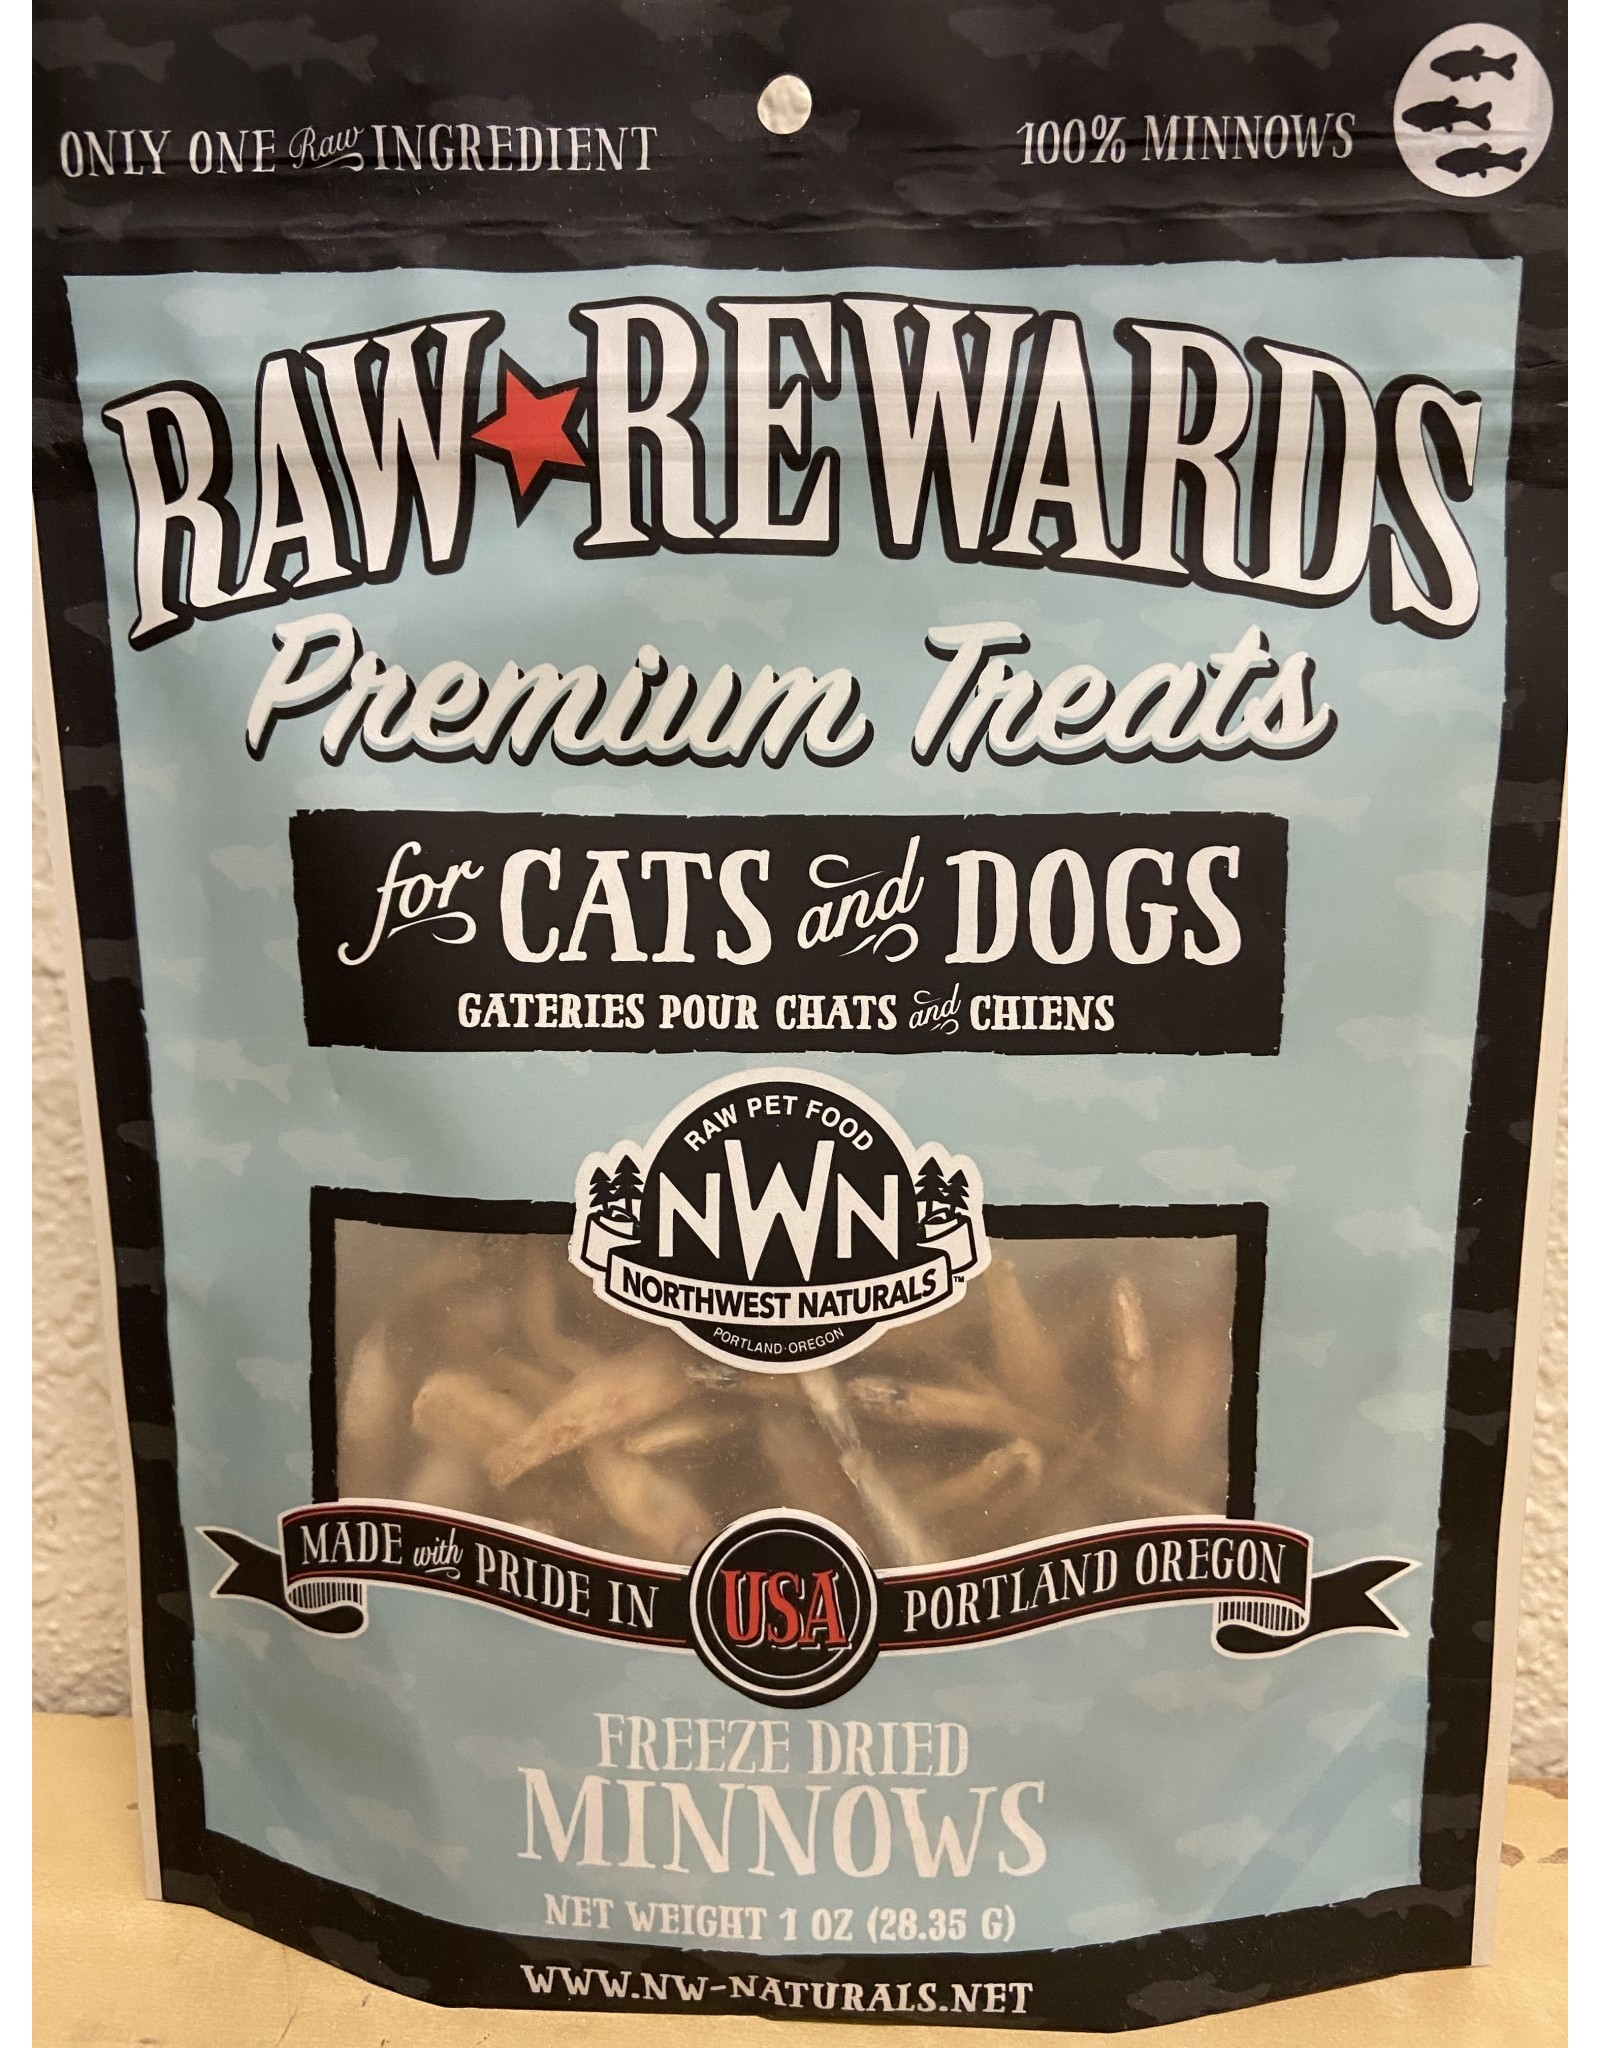 Northwest Naturals Northwest Naturals Premium Treats for Cats & Dogs Freeze Dried Minnows 1oz